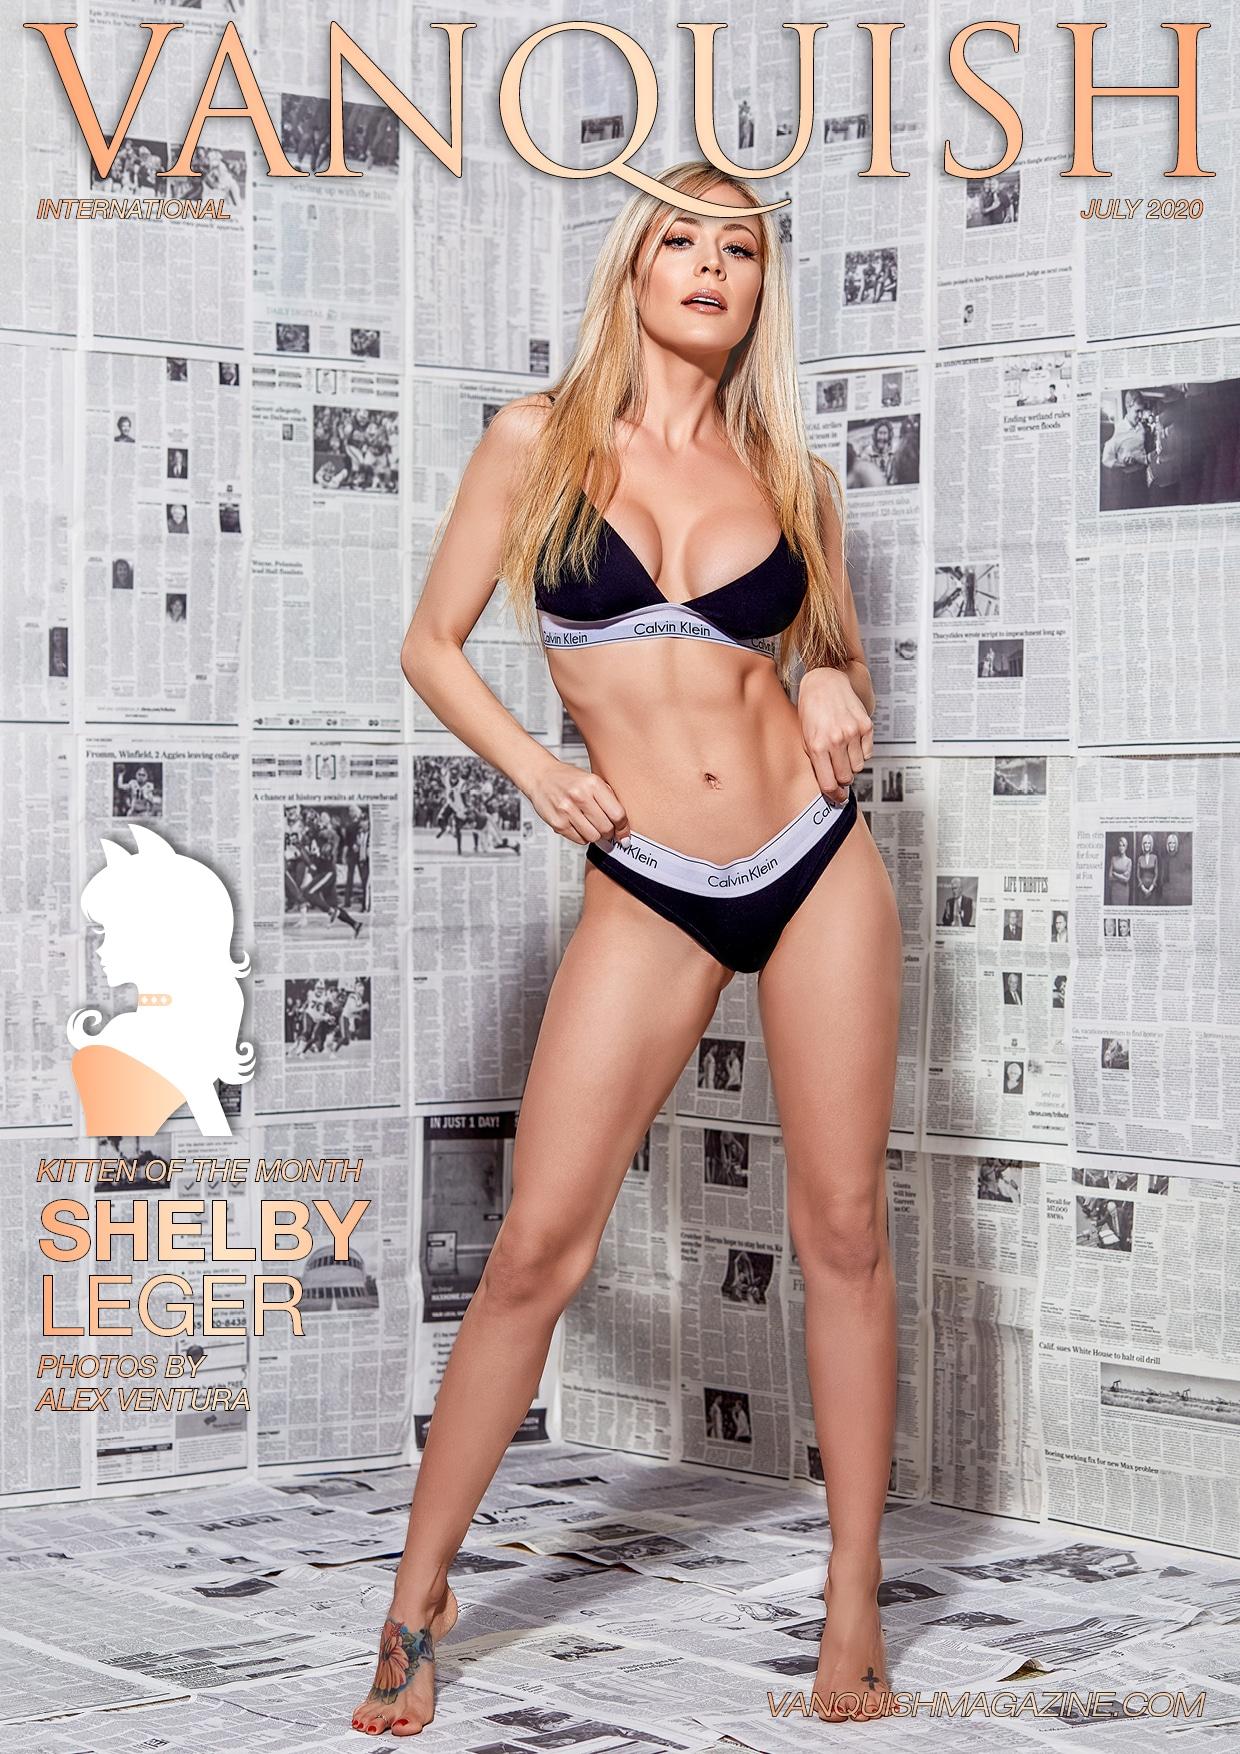 Vanquish Magazine - July 2020 - Shelby Leger 1